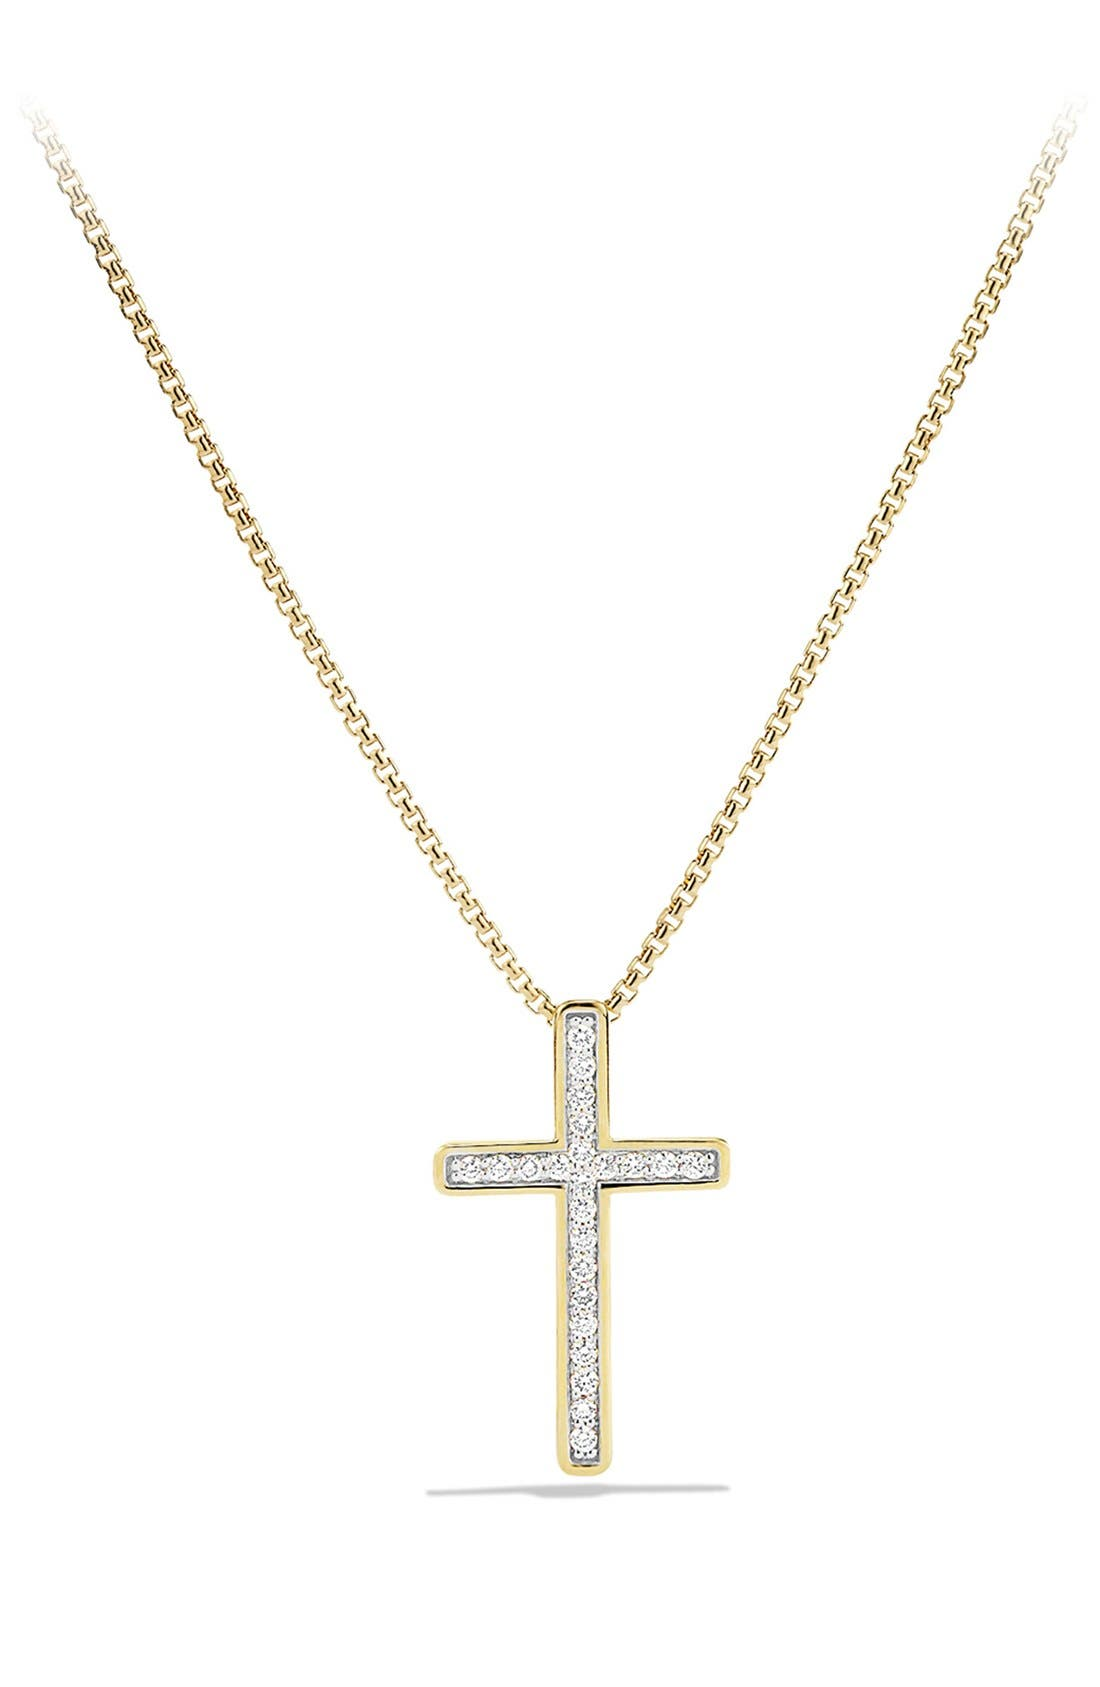 Alternate Image 1 Selected - David Yurman 'X' Petite Pavé Cross Necklace with Diamonds in Gold